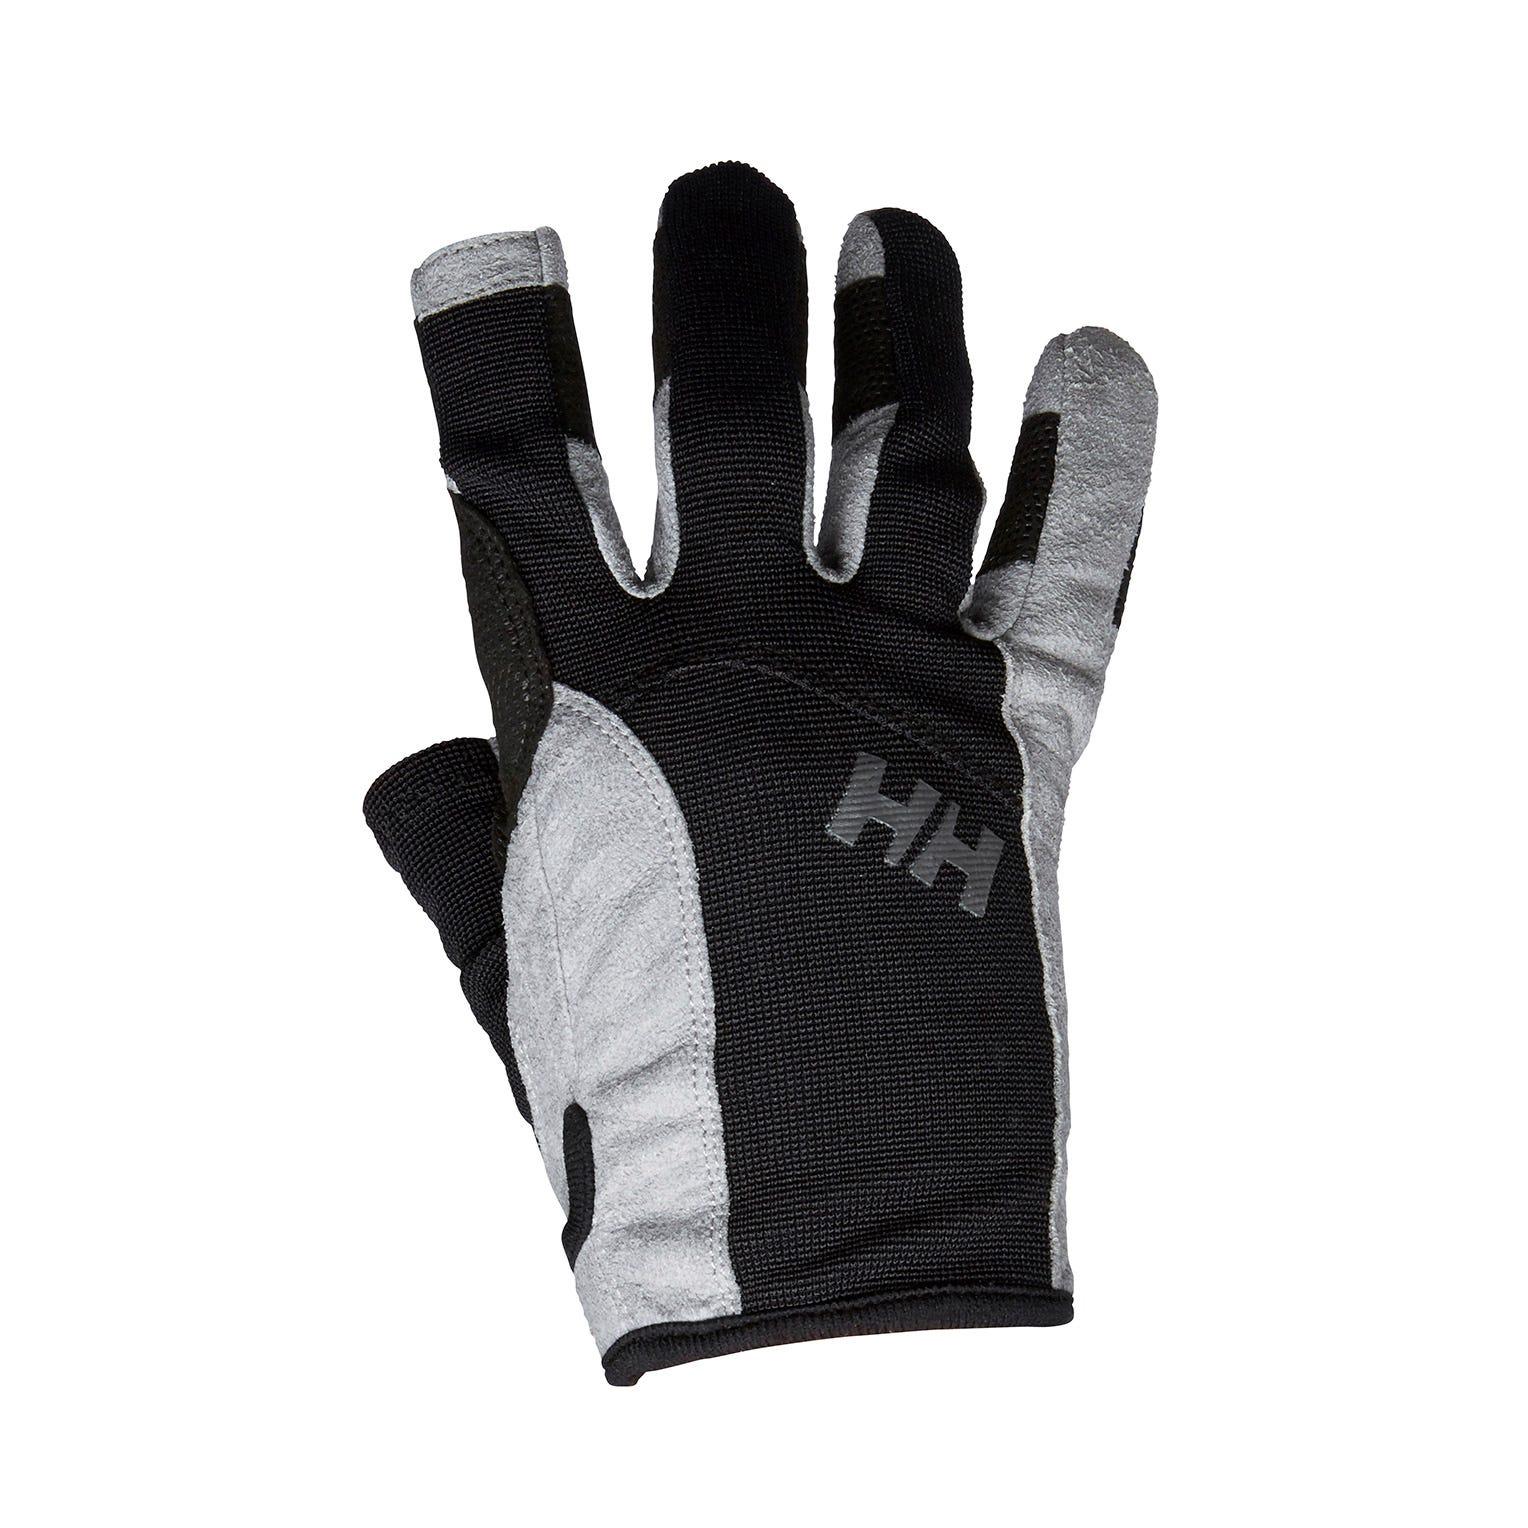 Helly Hansen Sailing Glove Long Black XS